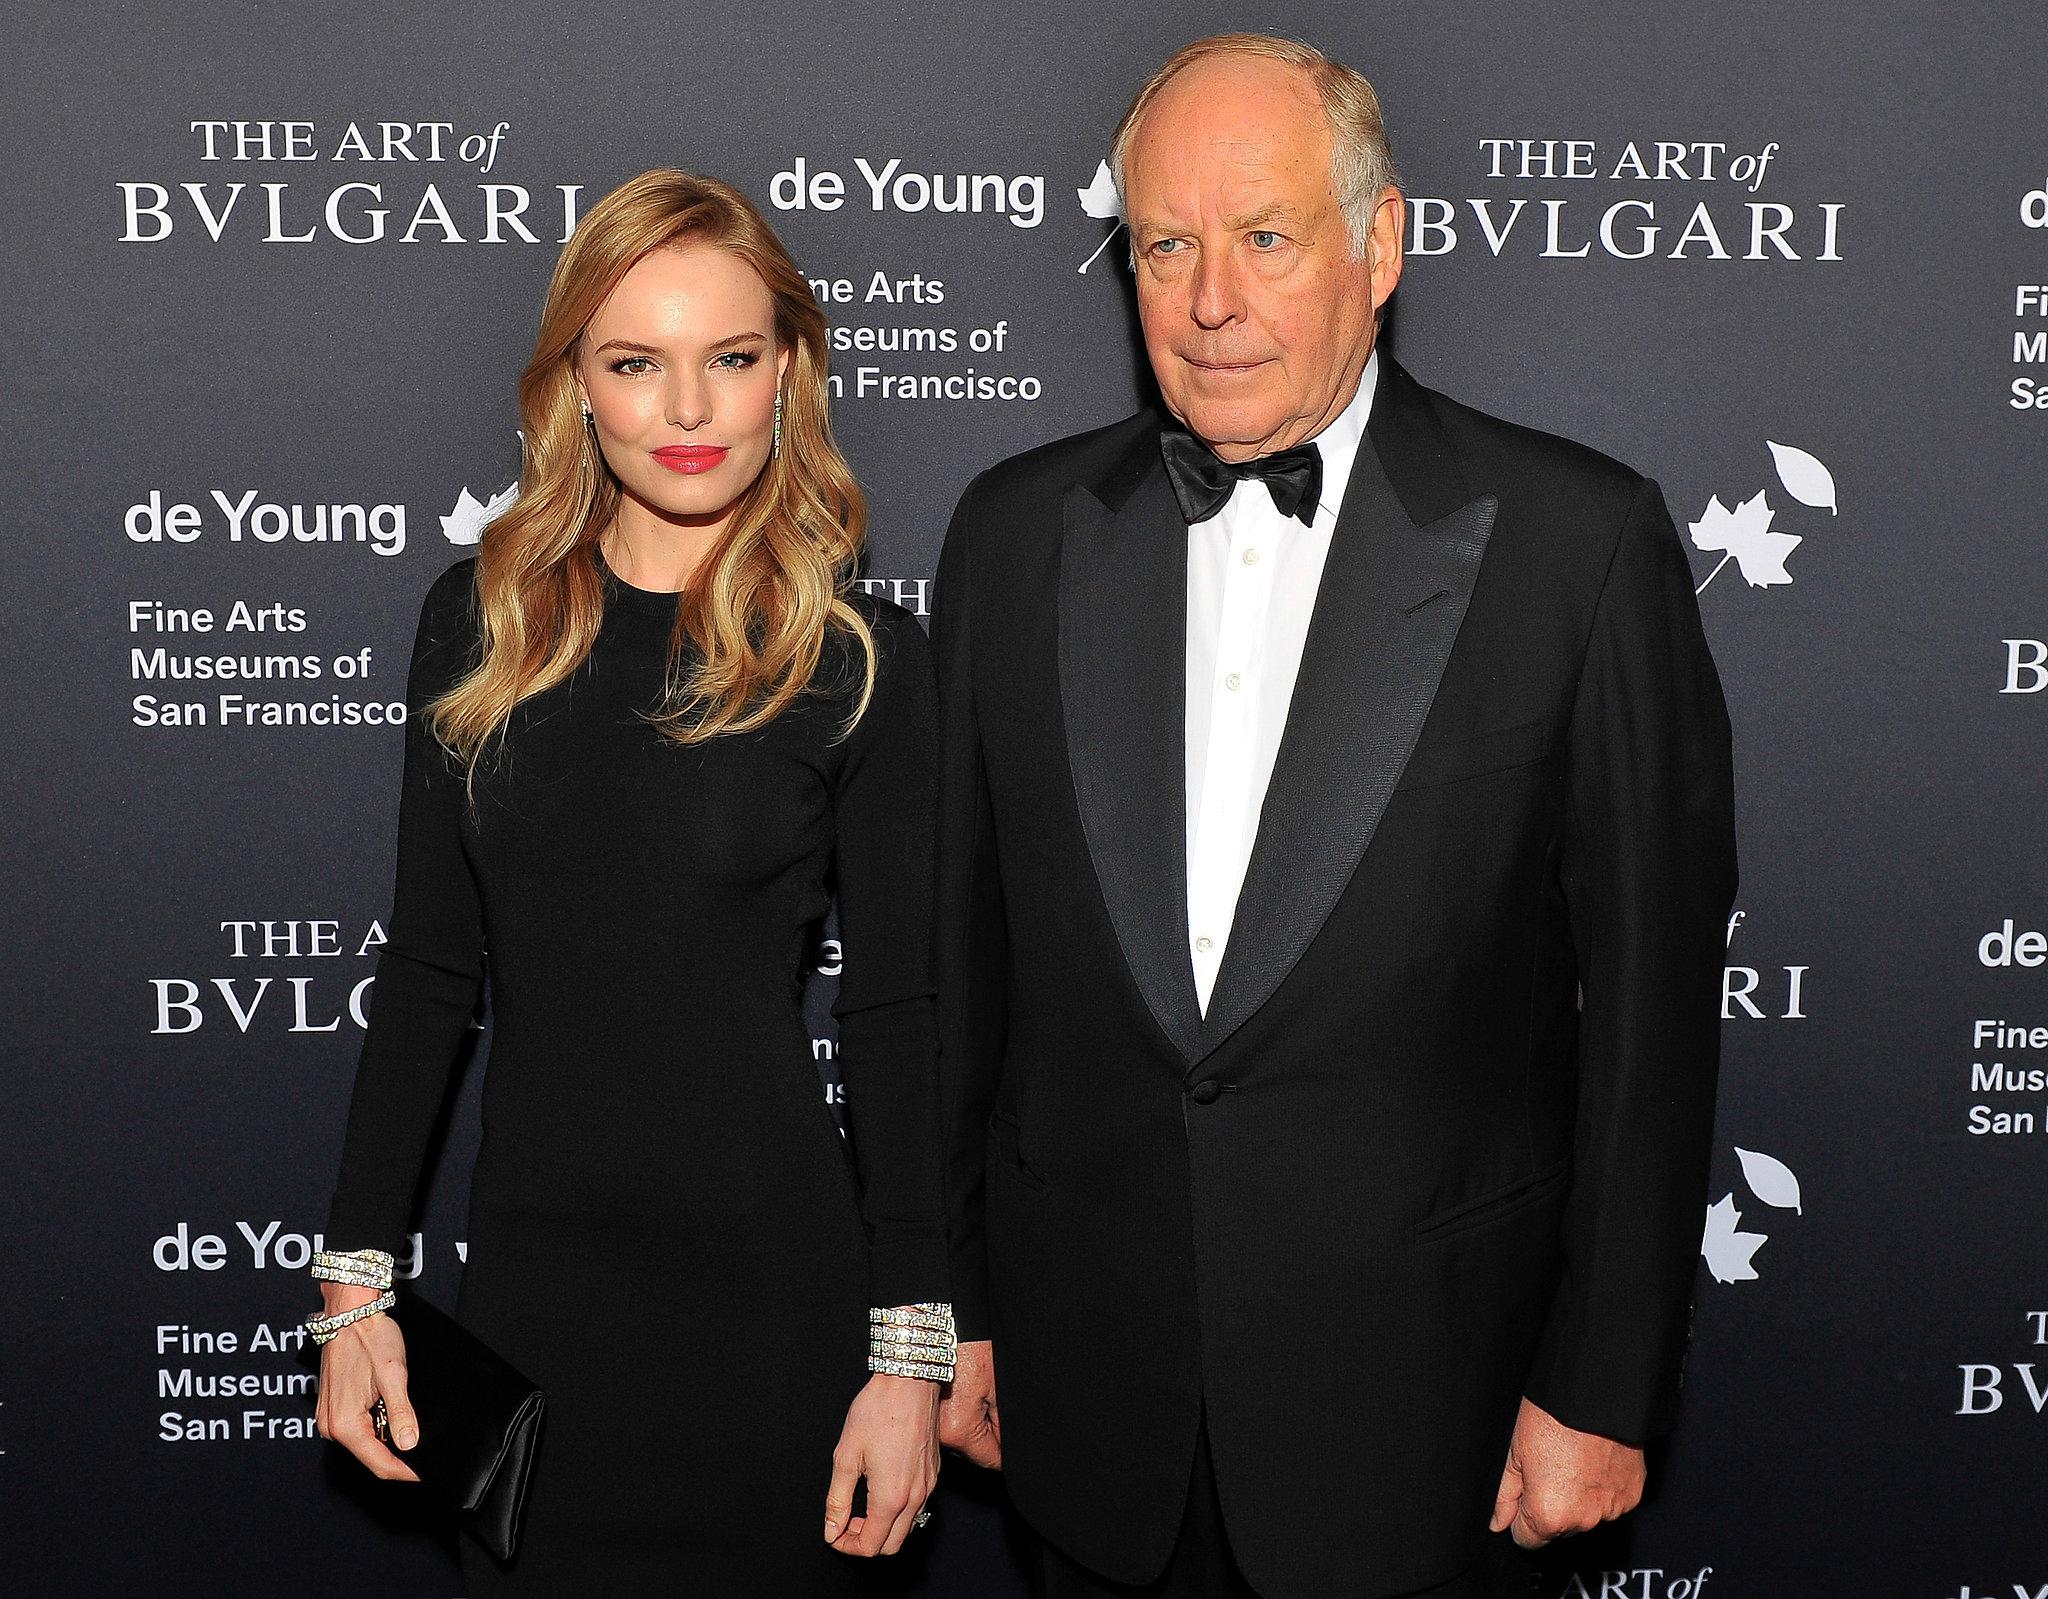 Kate Bosworth posed with Bulgari chairman Nicola Bulgari at the event.